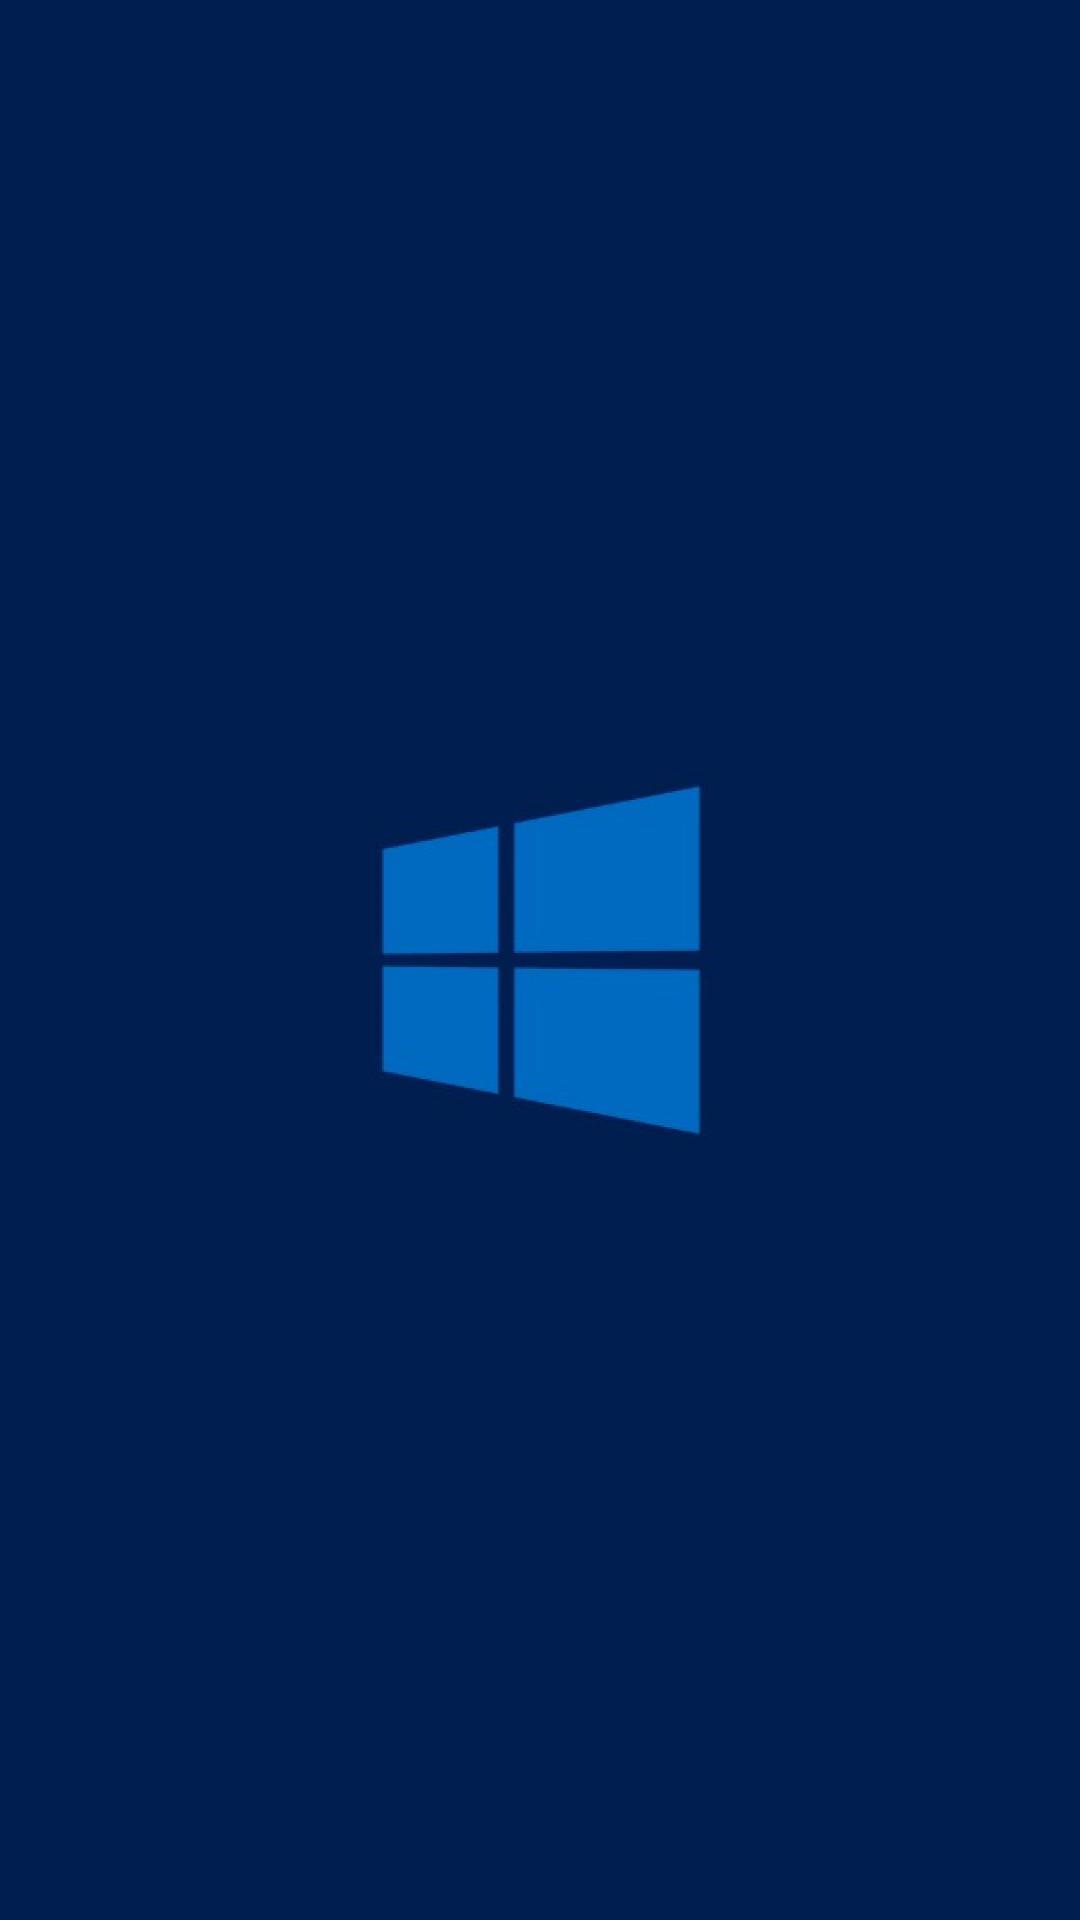 Blue minimalistic metro windows 8 dark clean logo wallpaper 18803 1080x1920